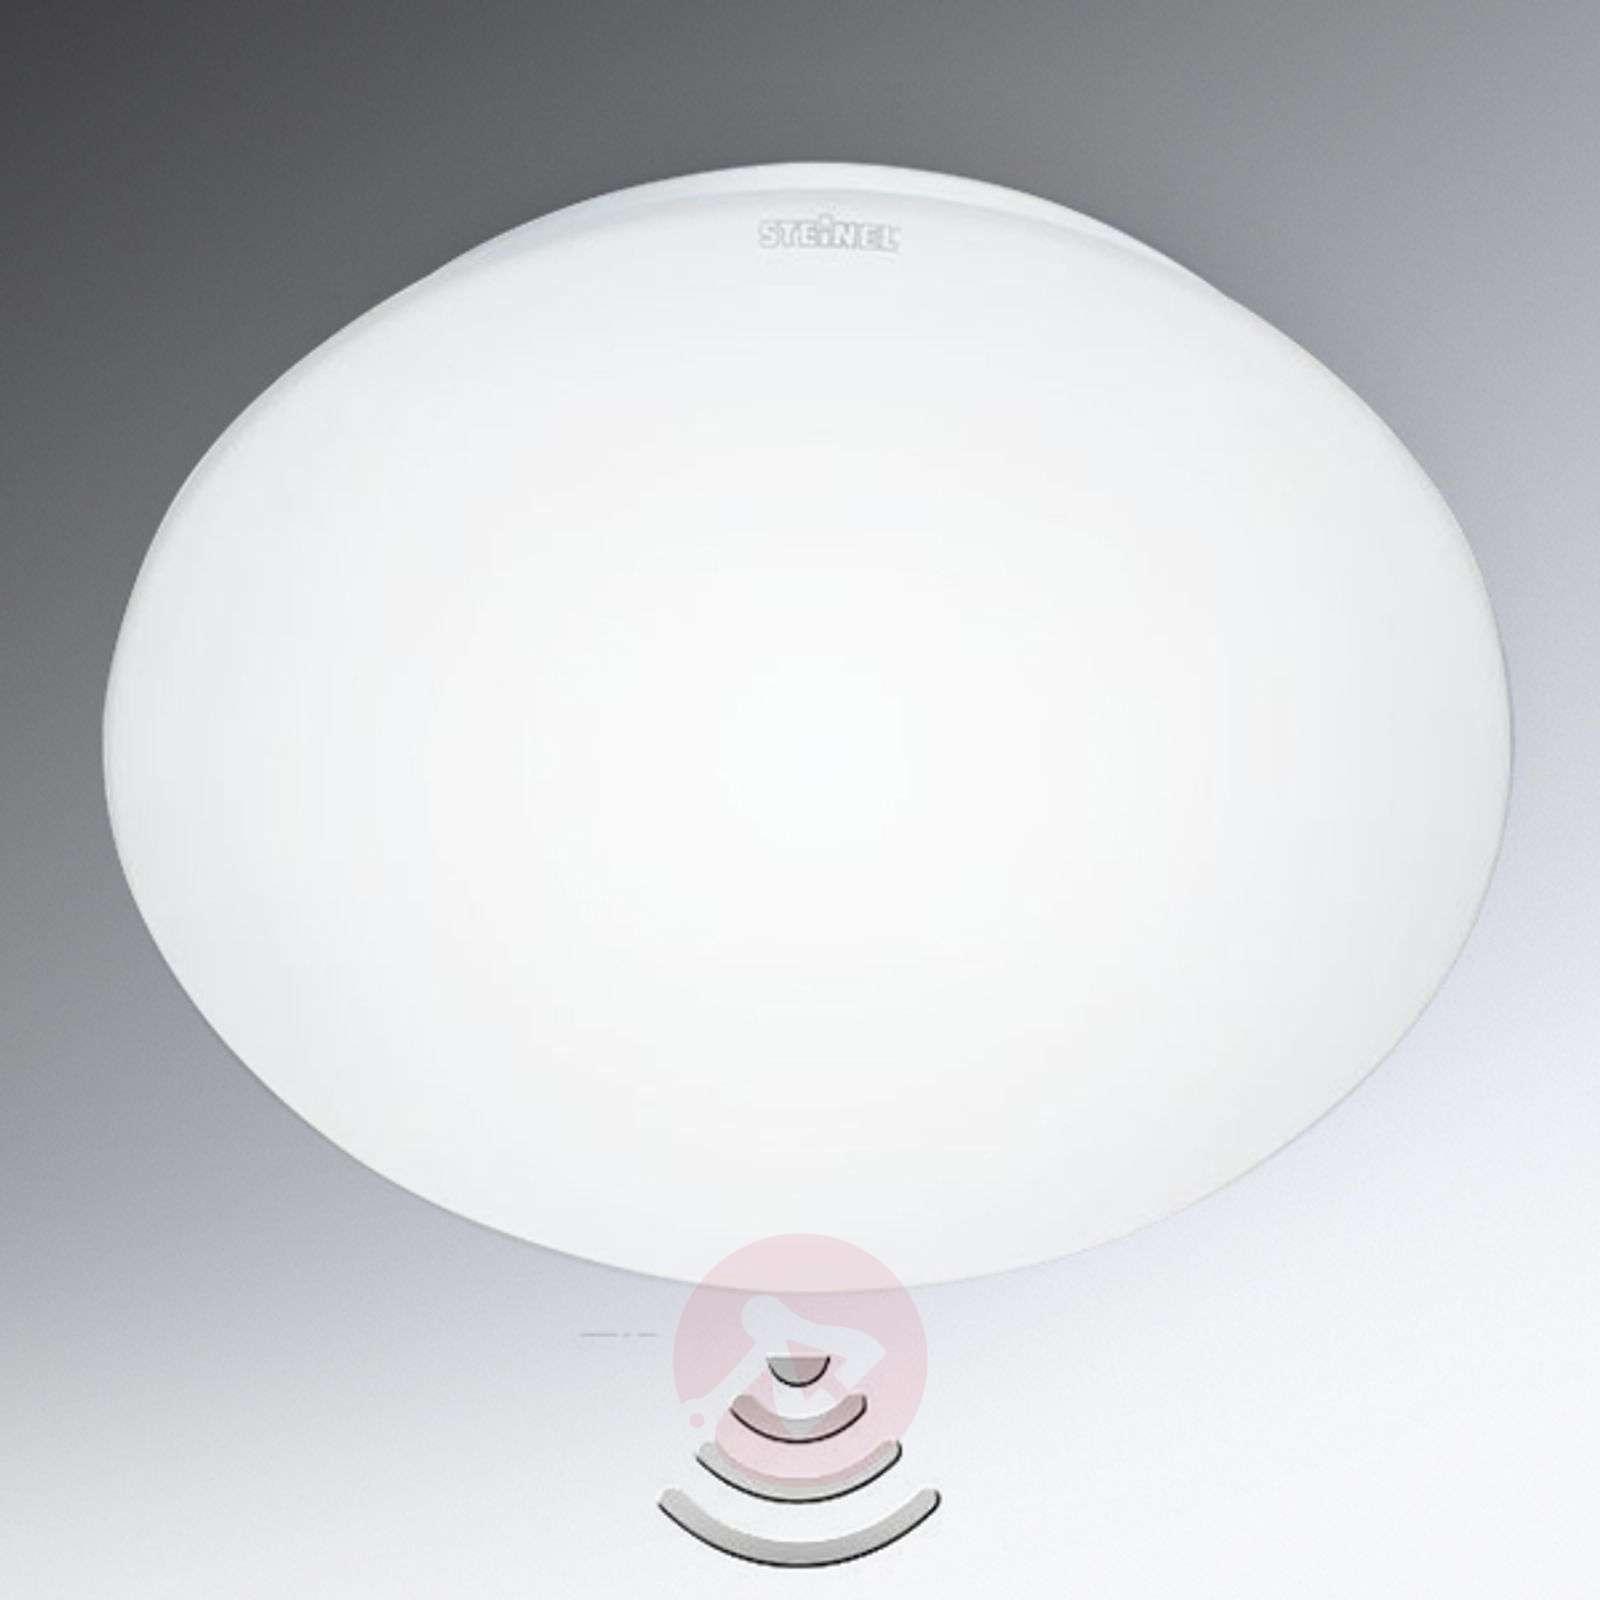 Pyöreä RS 16 LED-kattovalaisin tunnistimella-8505713-01